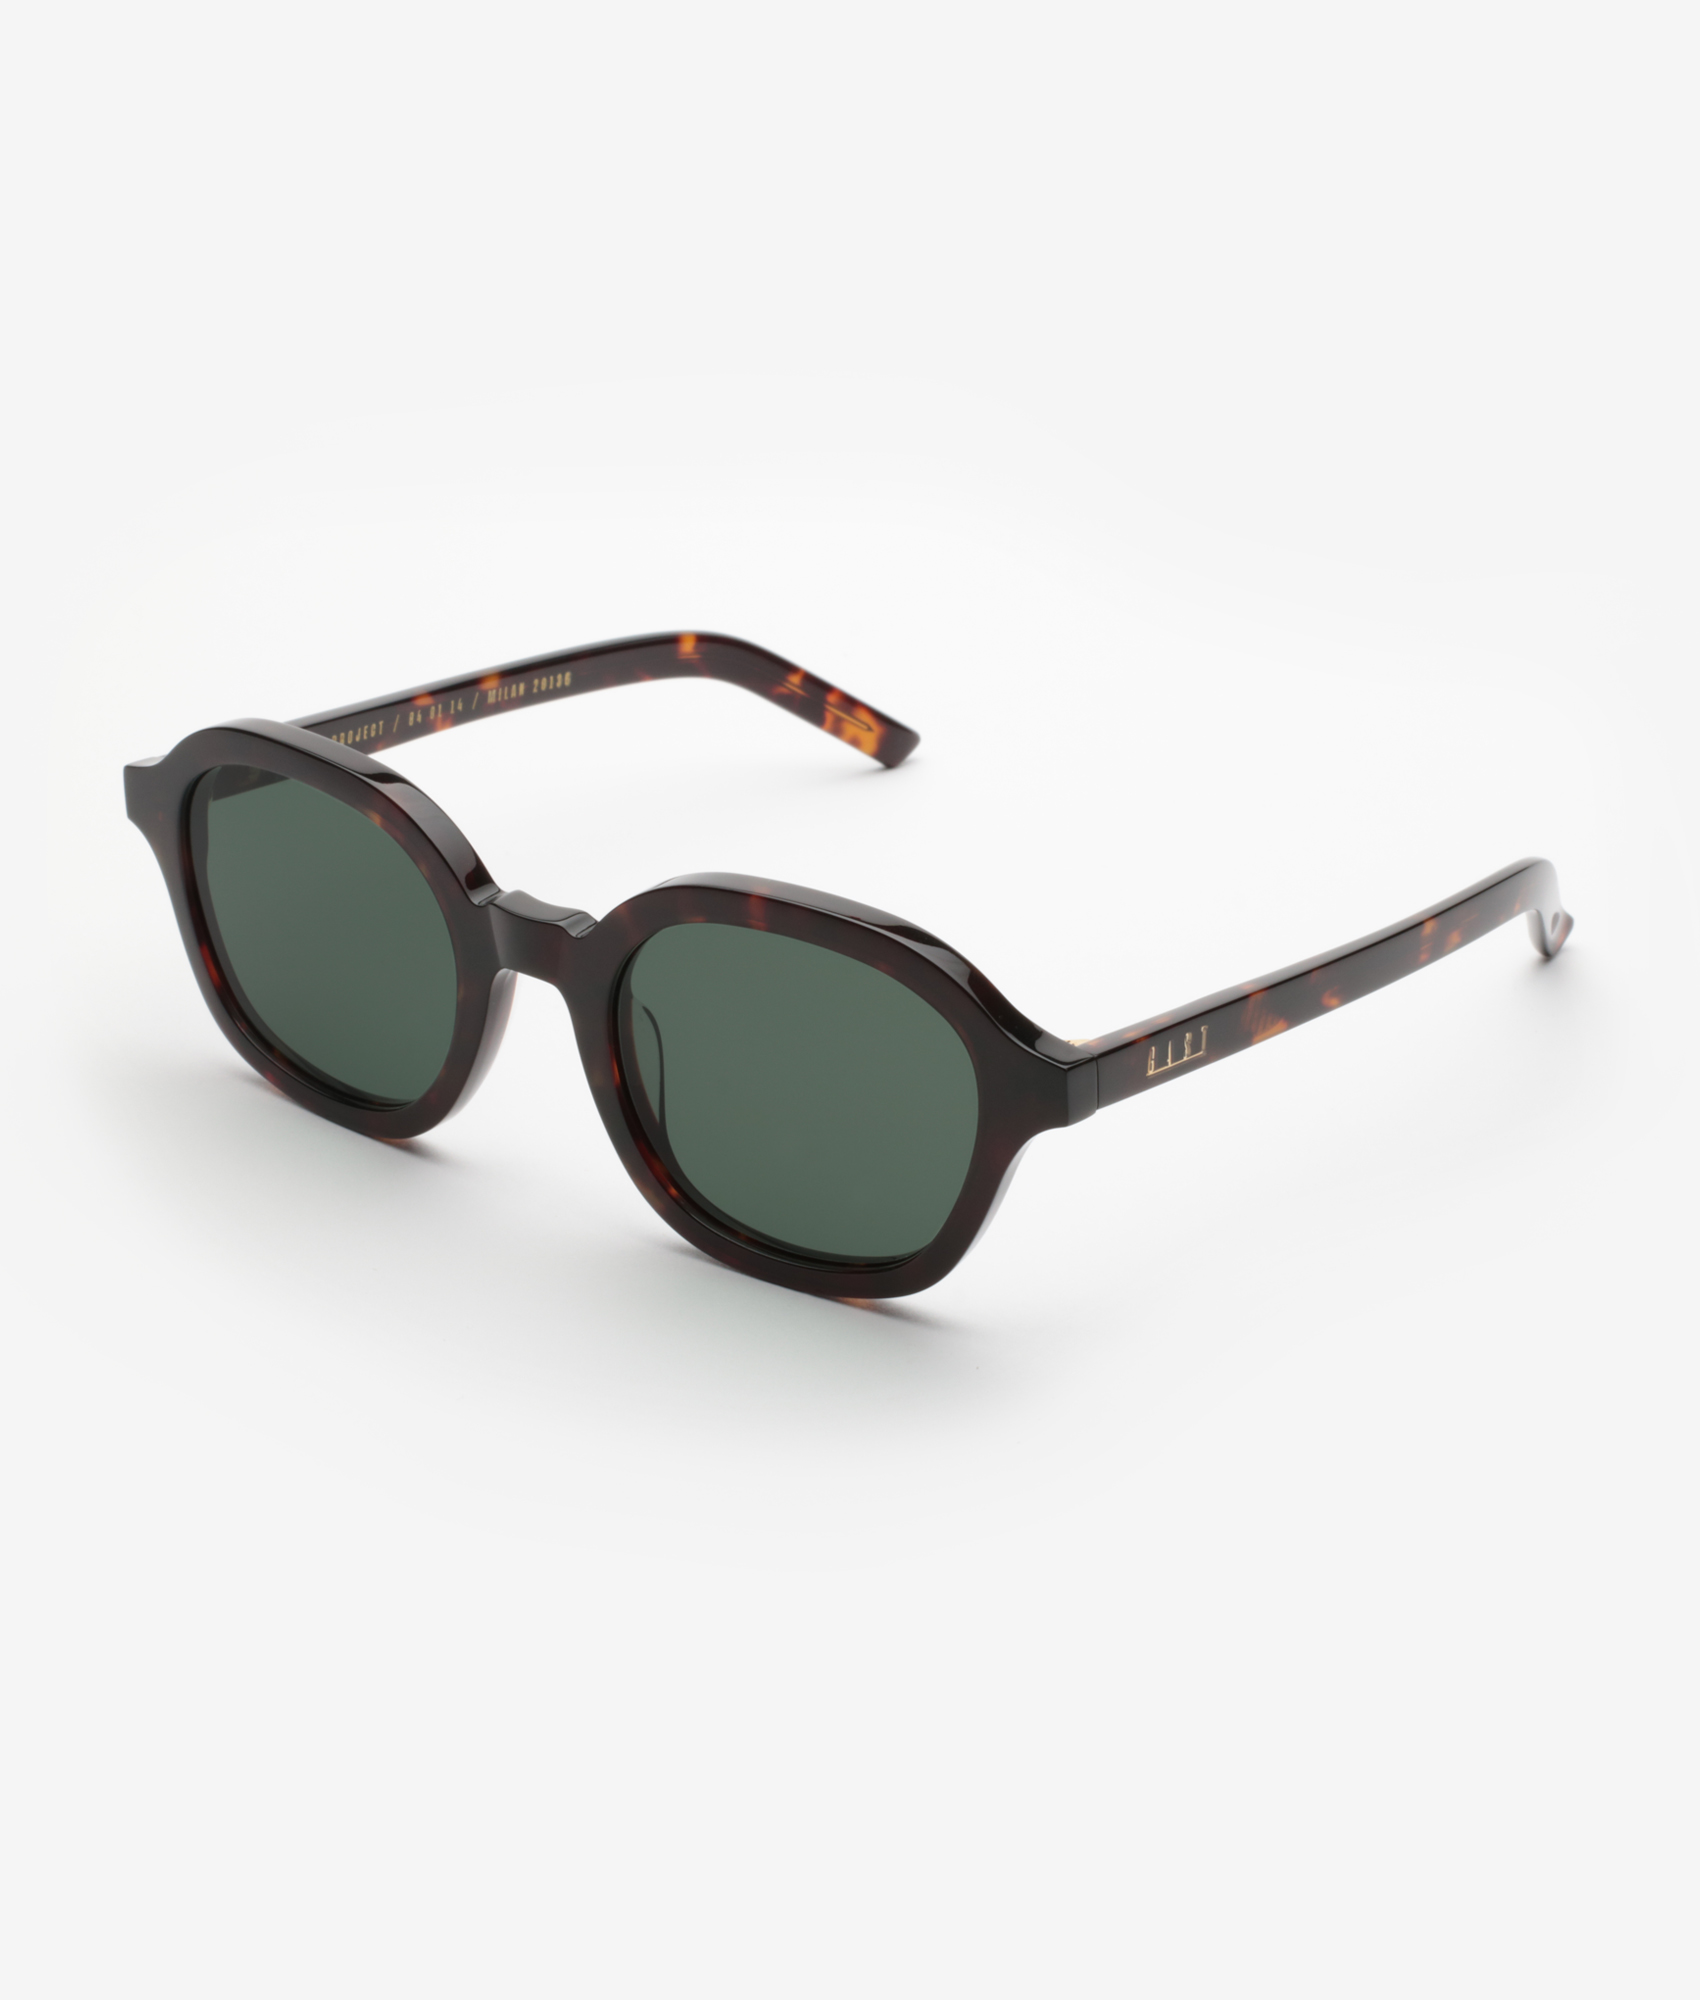 Mein classic havana Gast Sunglasses